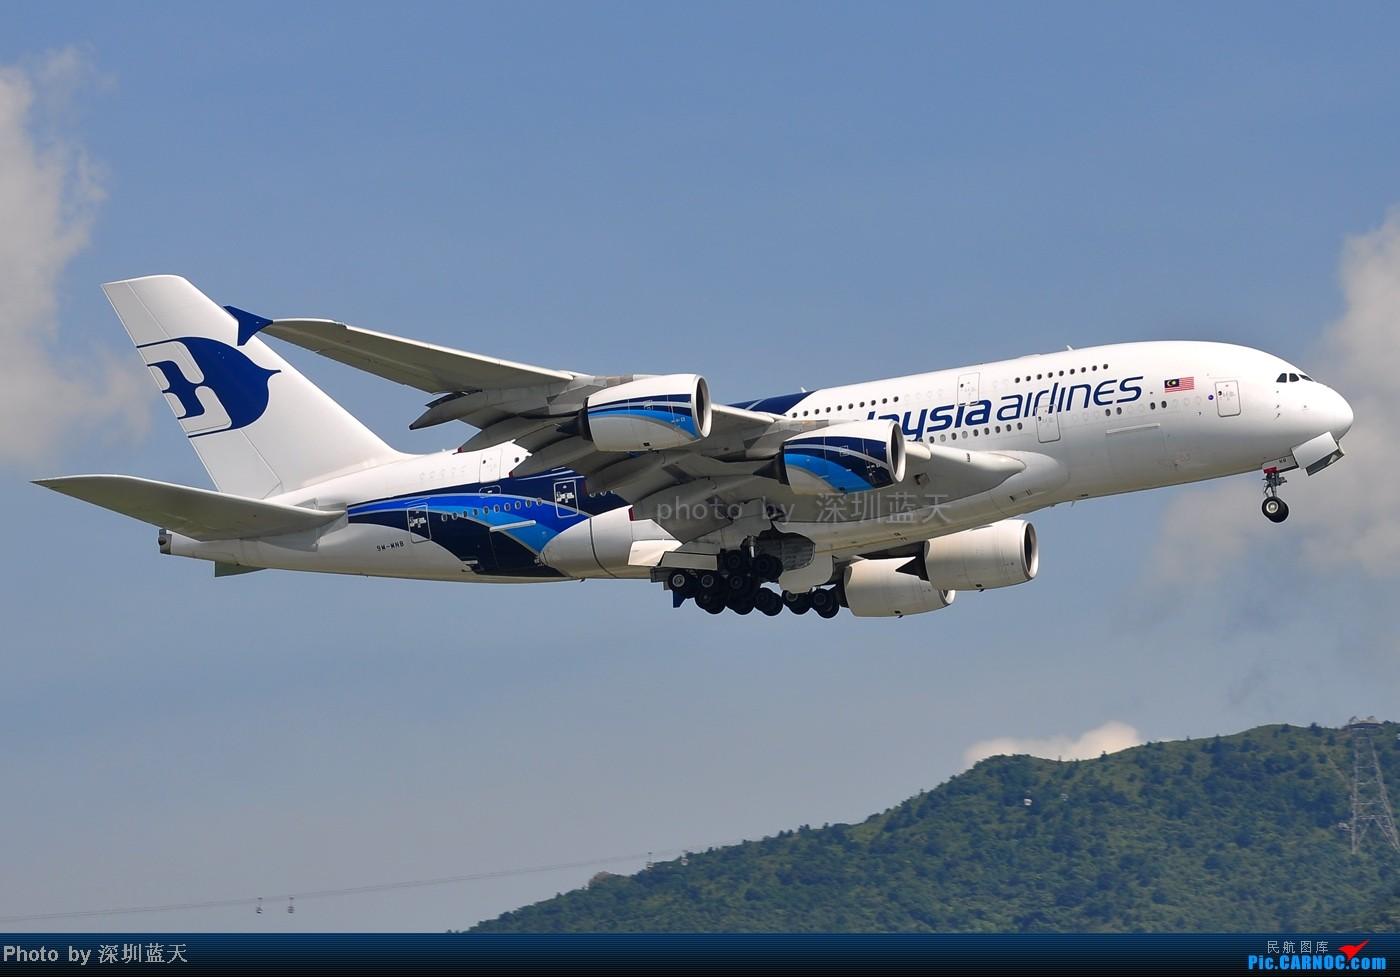 Re:[原创]【深圳飞友会】香港飞机维修区海堤起飞新拍—泰航A380斐济A330新装等 AIRBUS A380-841 9M-MNB 中国香港赤鱲角国际机场